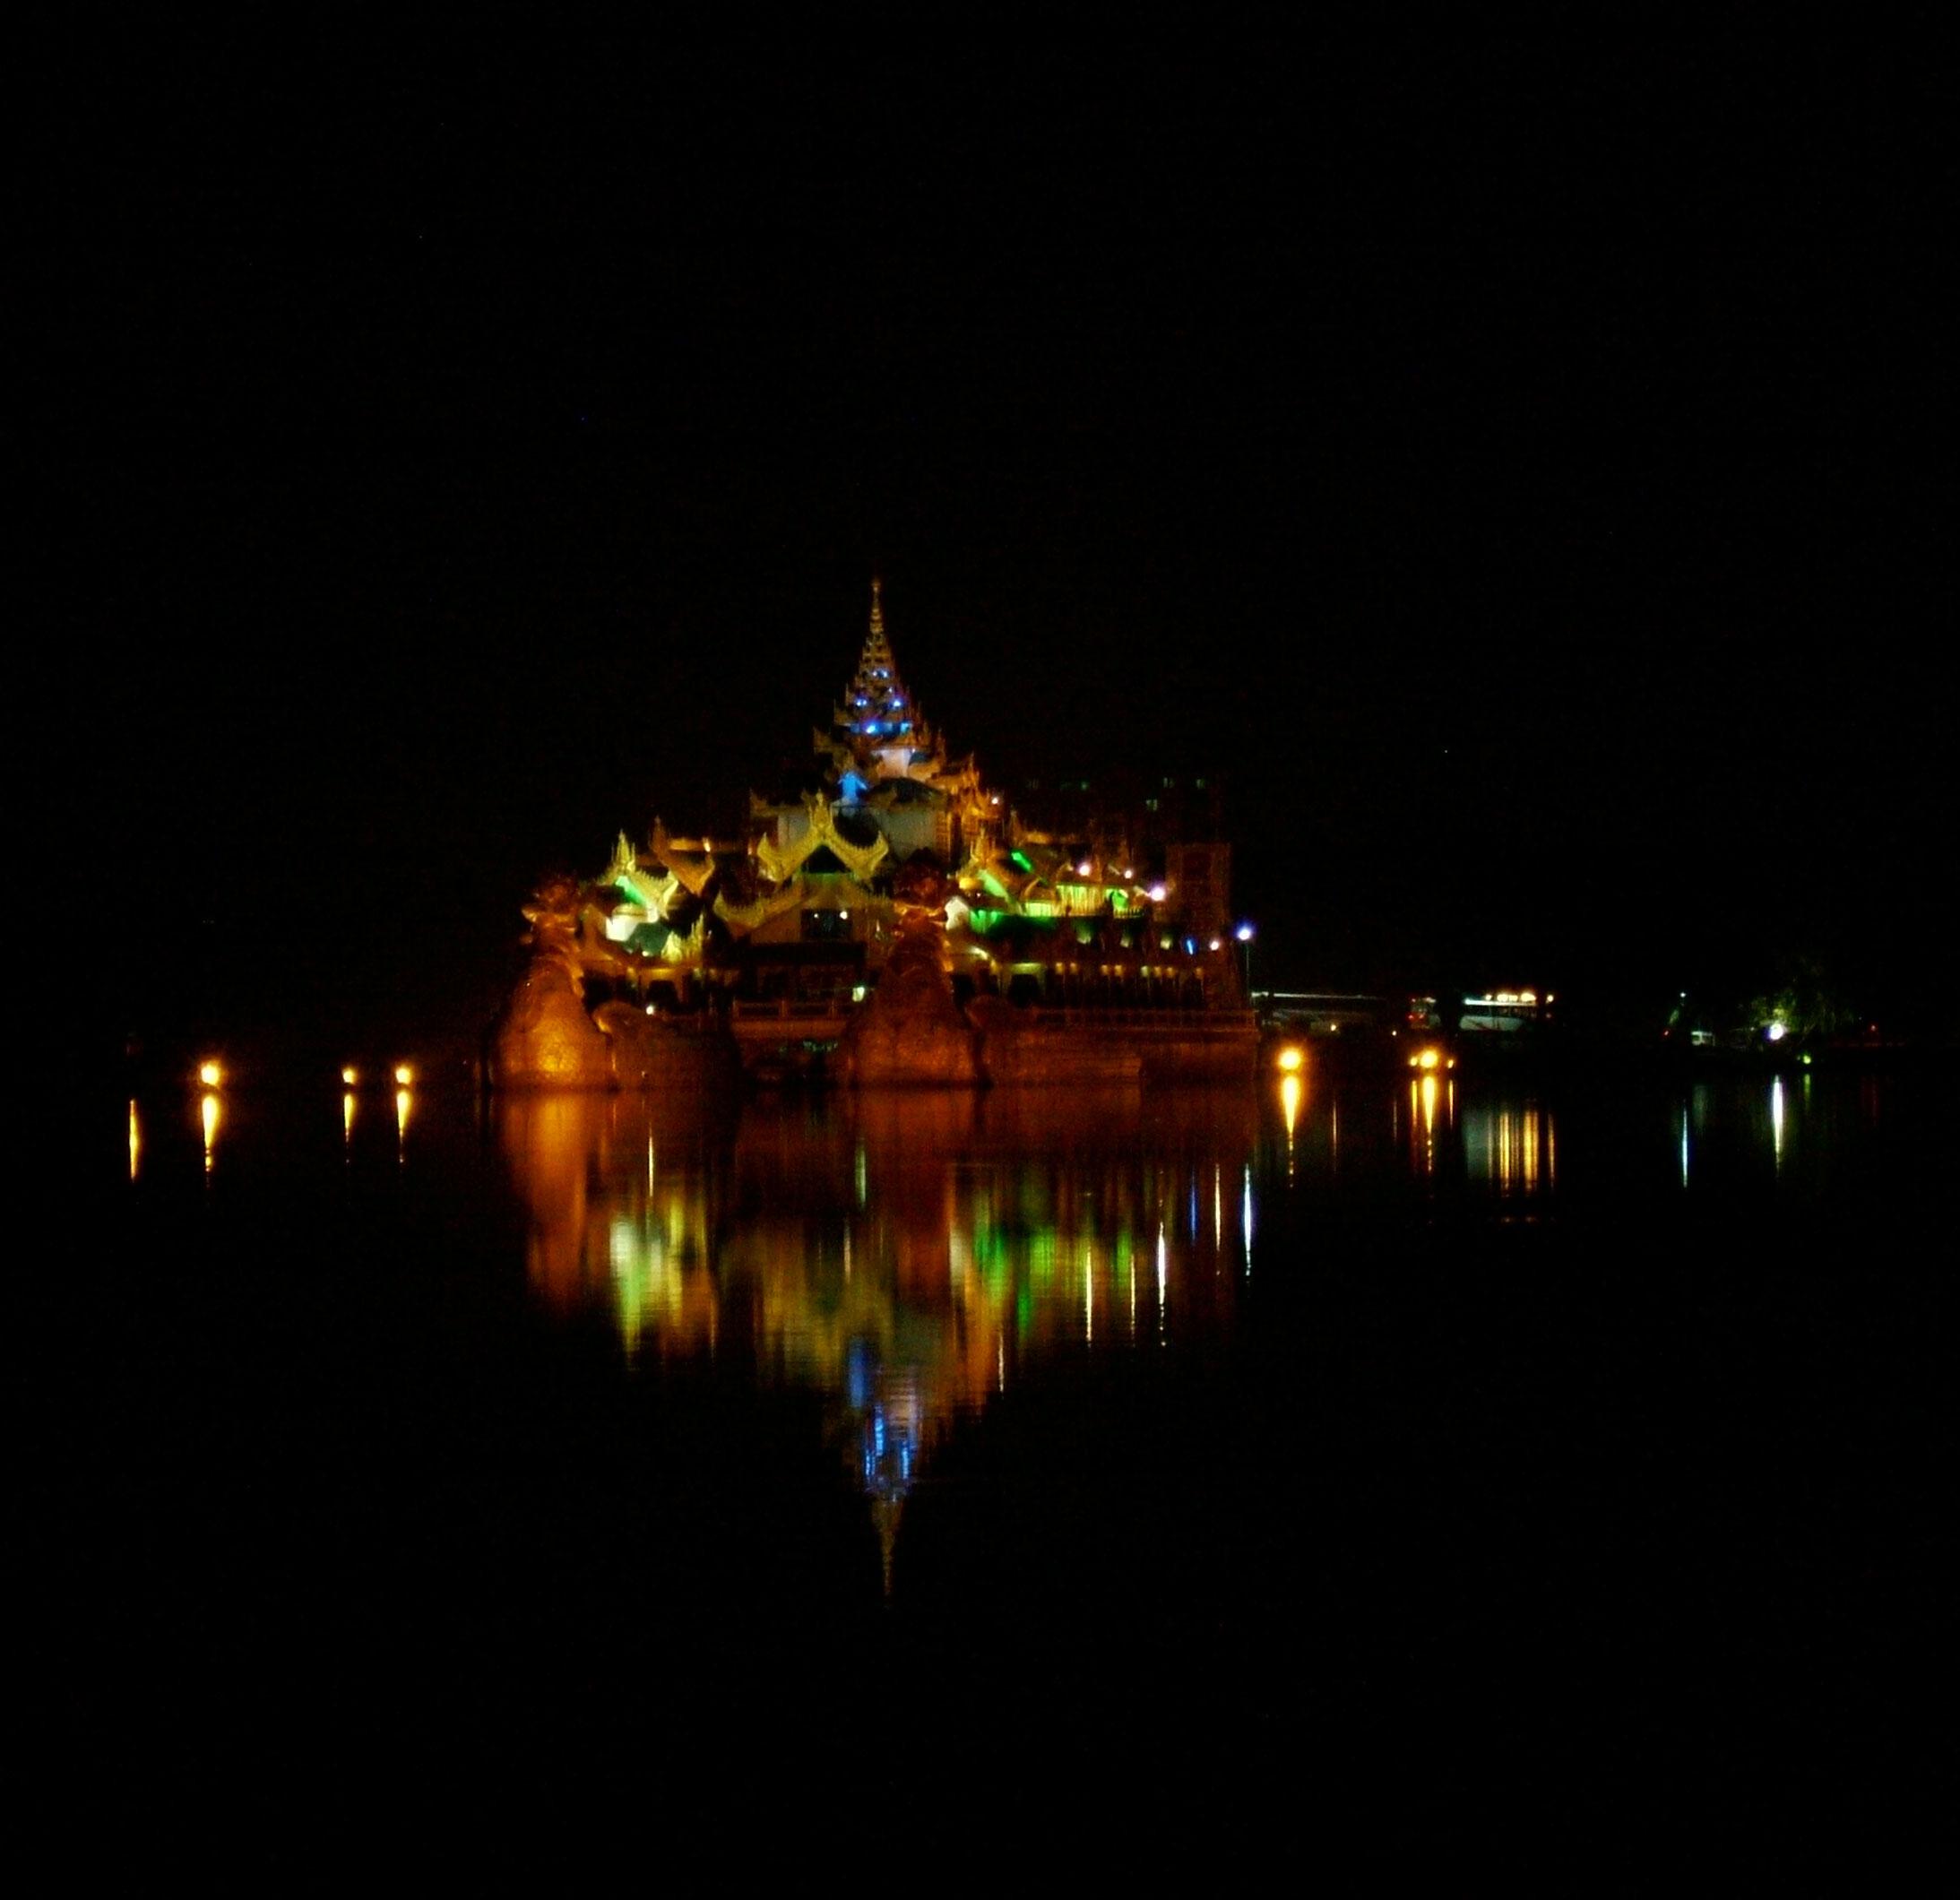 Myanmar Yangon Kandawgyi Palace Hotel royal barge Nov 2004 14